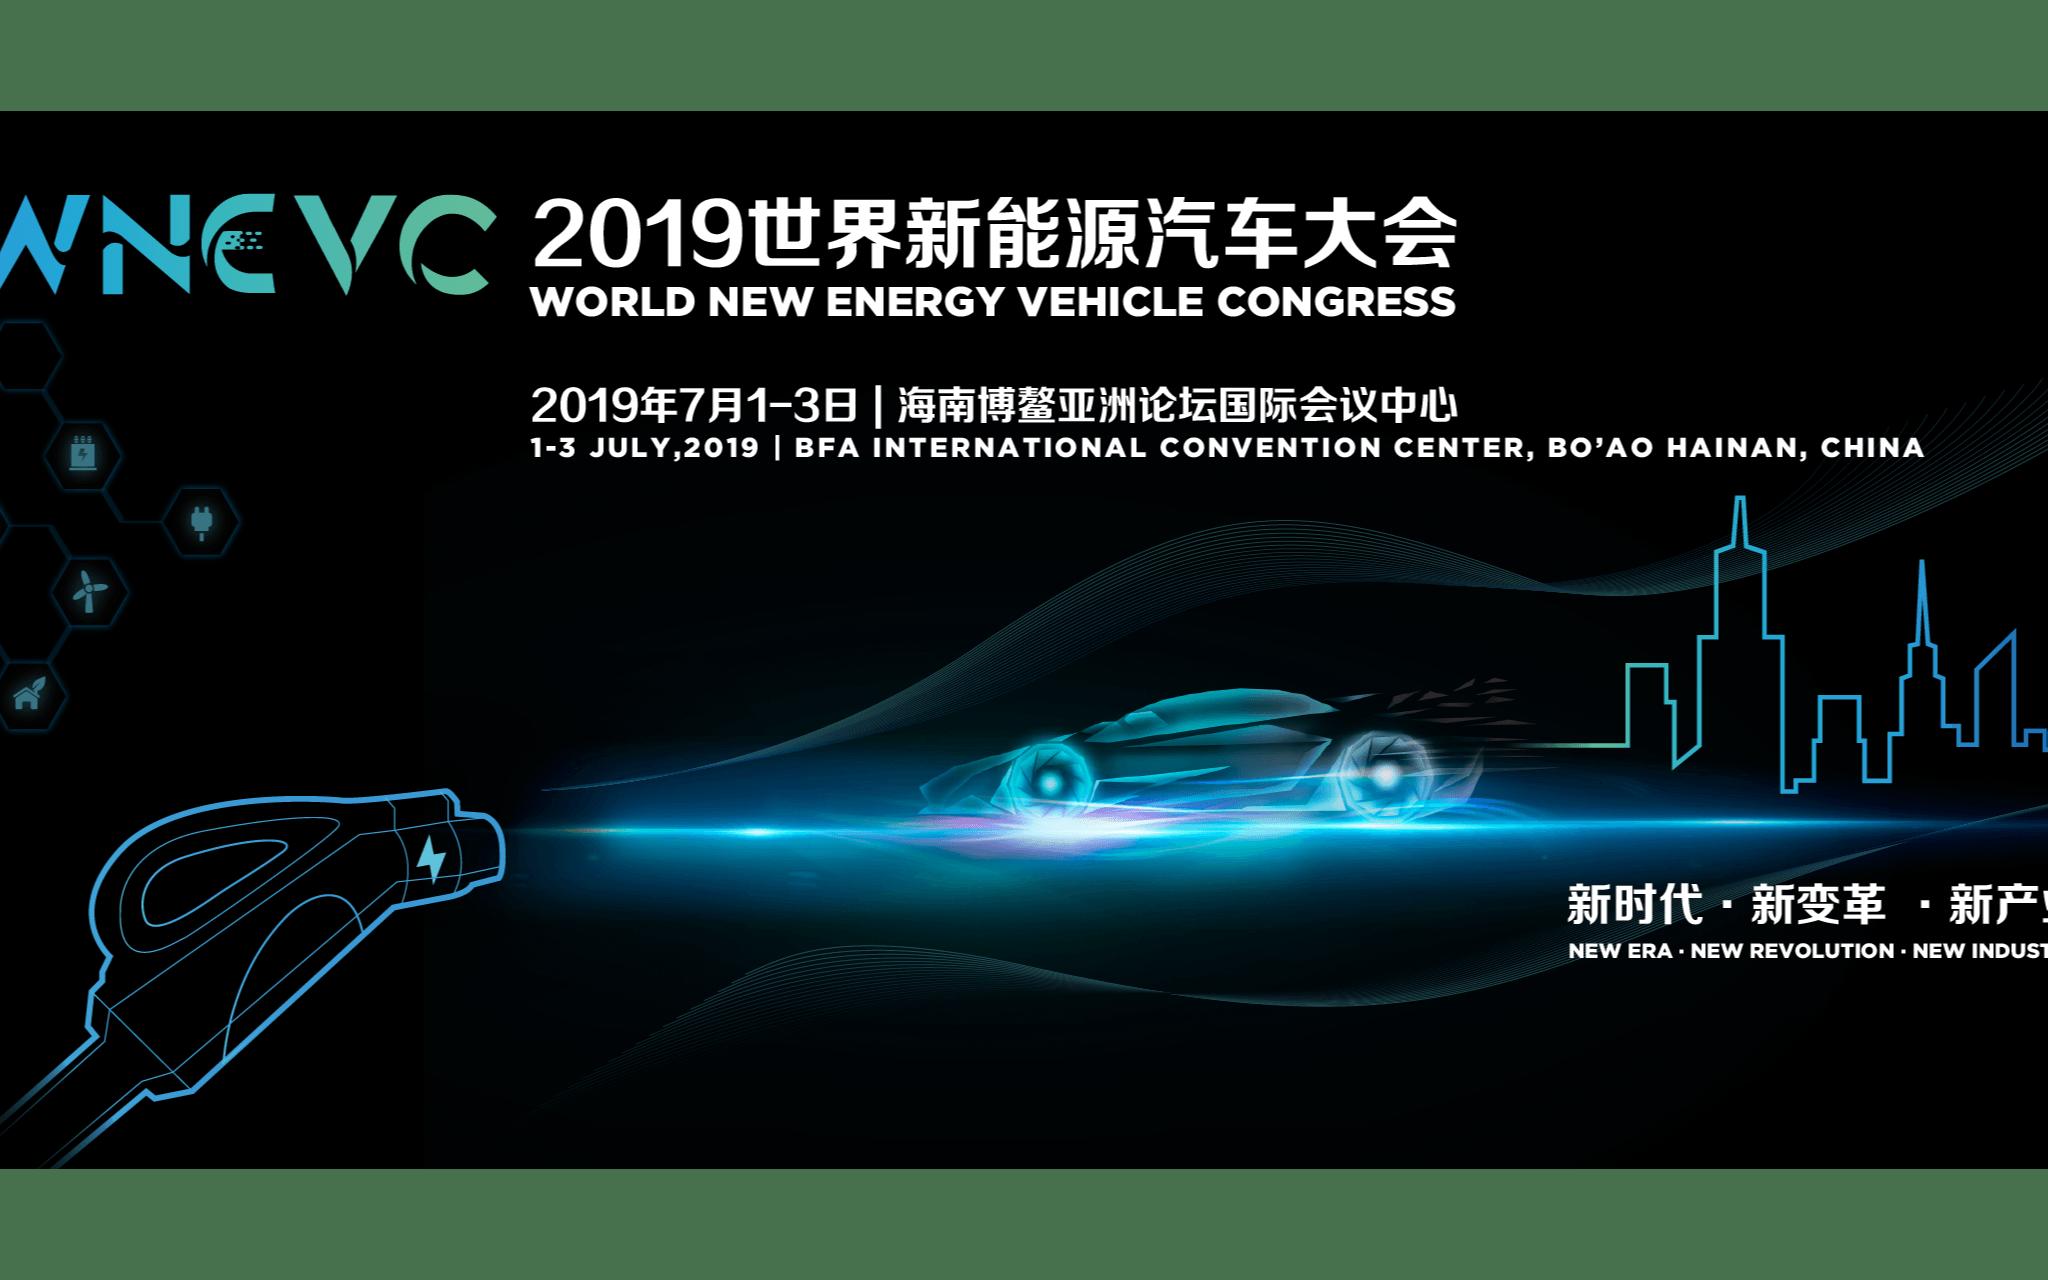 WNEVC2019世界新动力轿车大会(琼海)